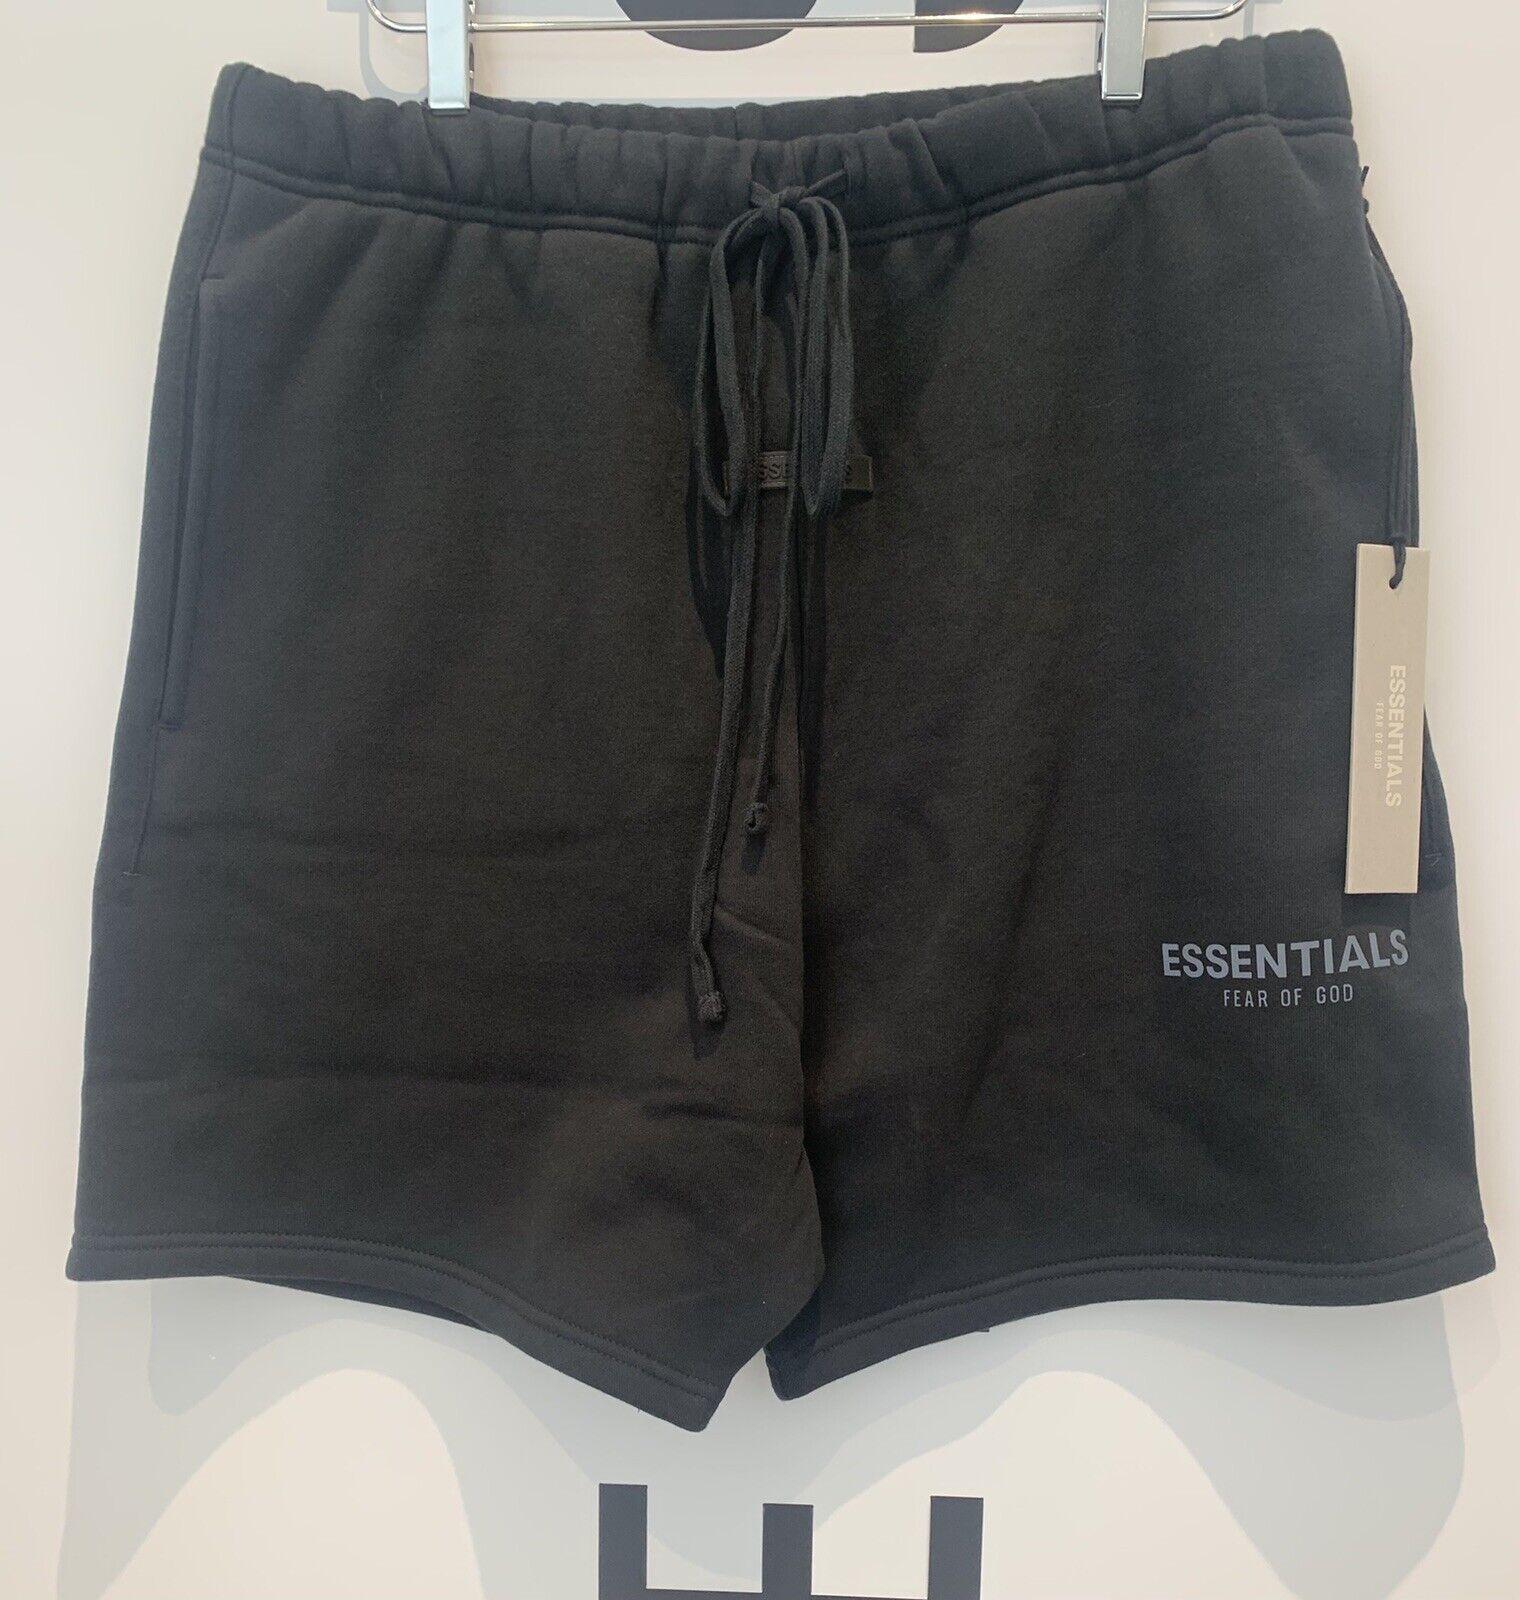 Fear Of God X Essentials Black Sweat Shorts - Size Medium - MAY 2021